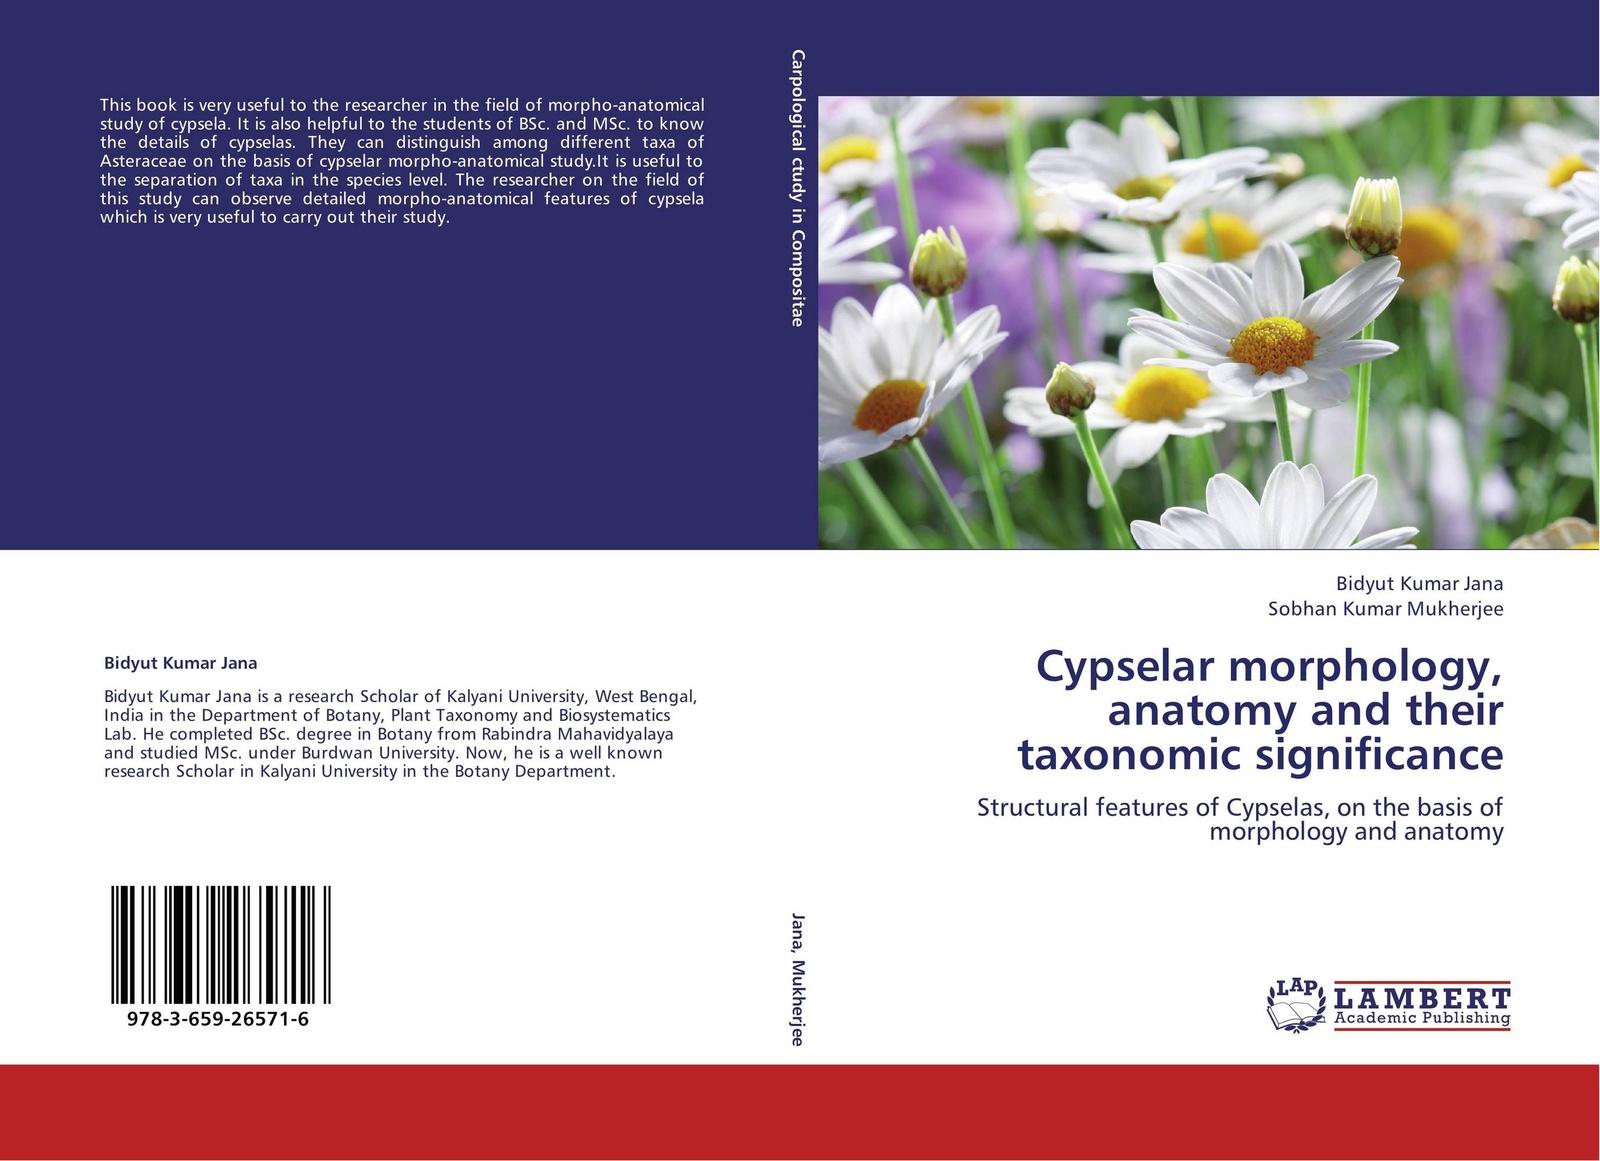 Bidyut Kumar Jana and Sobhan Mukherjee Cypselar morphology, anatomy their taxonomic significance